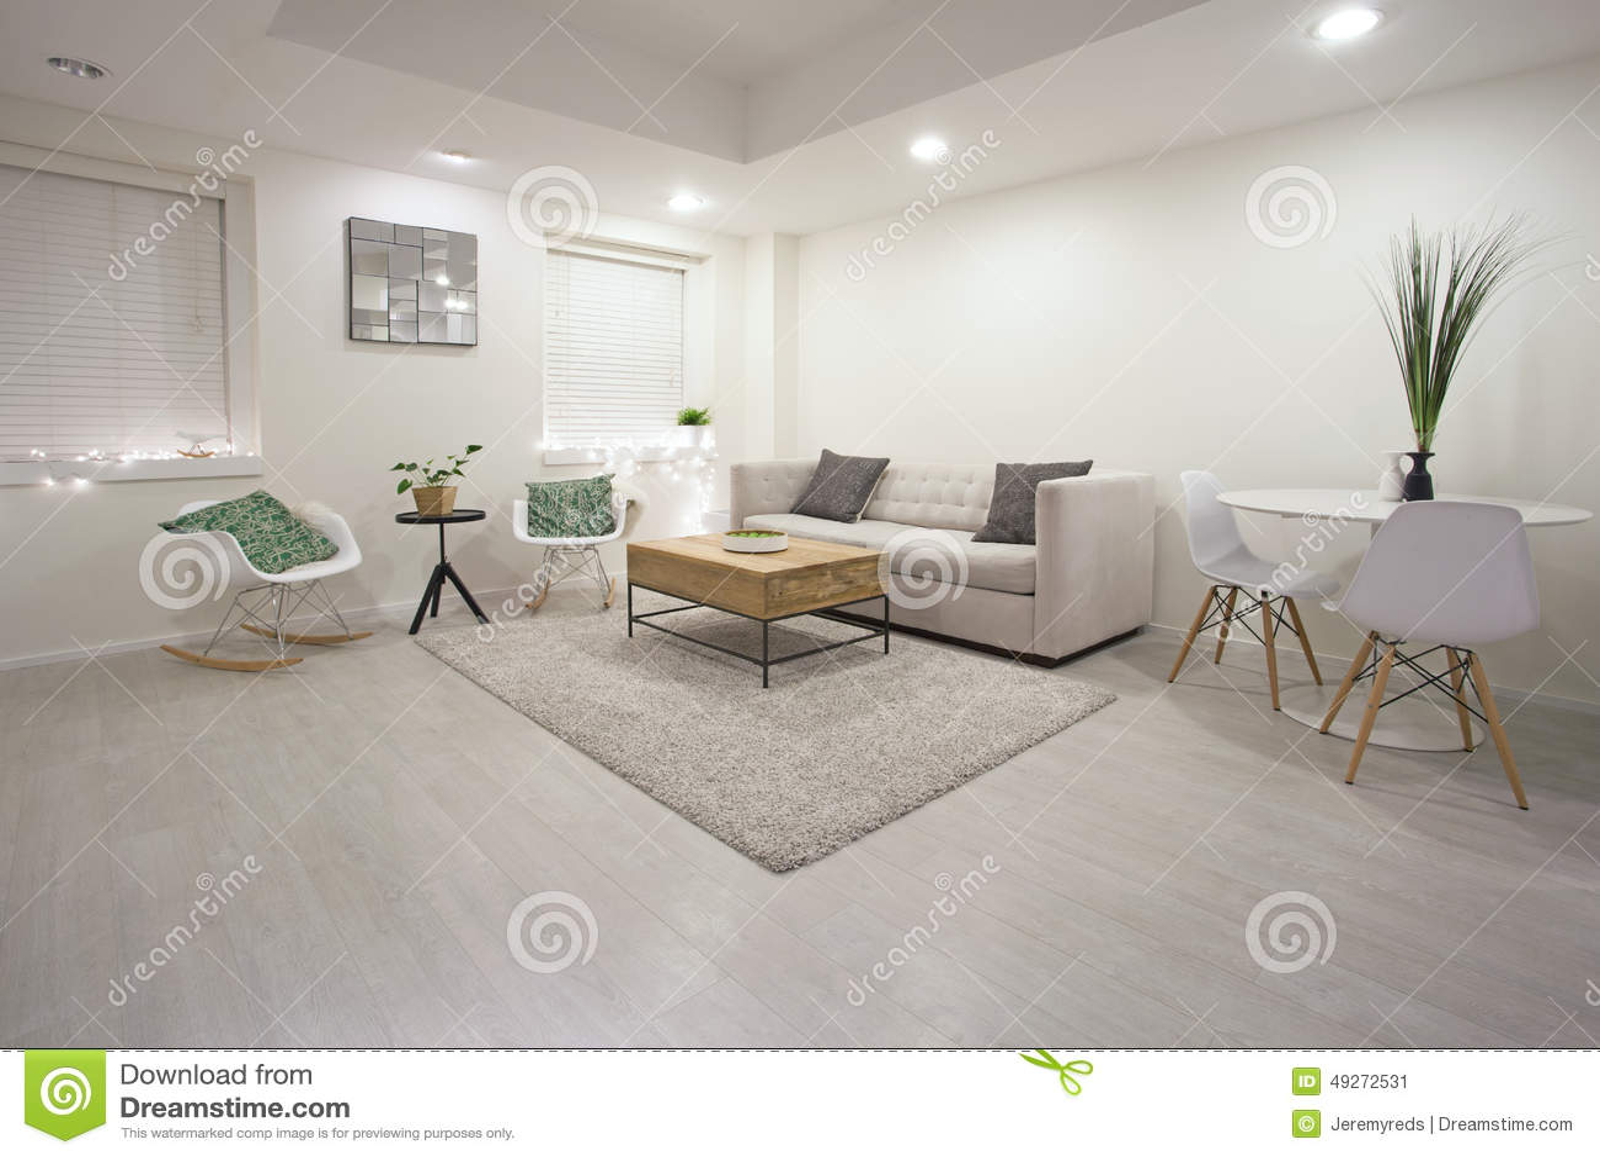 Diseño moderno de la sala de estar